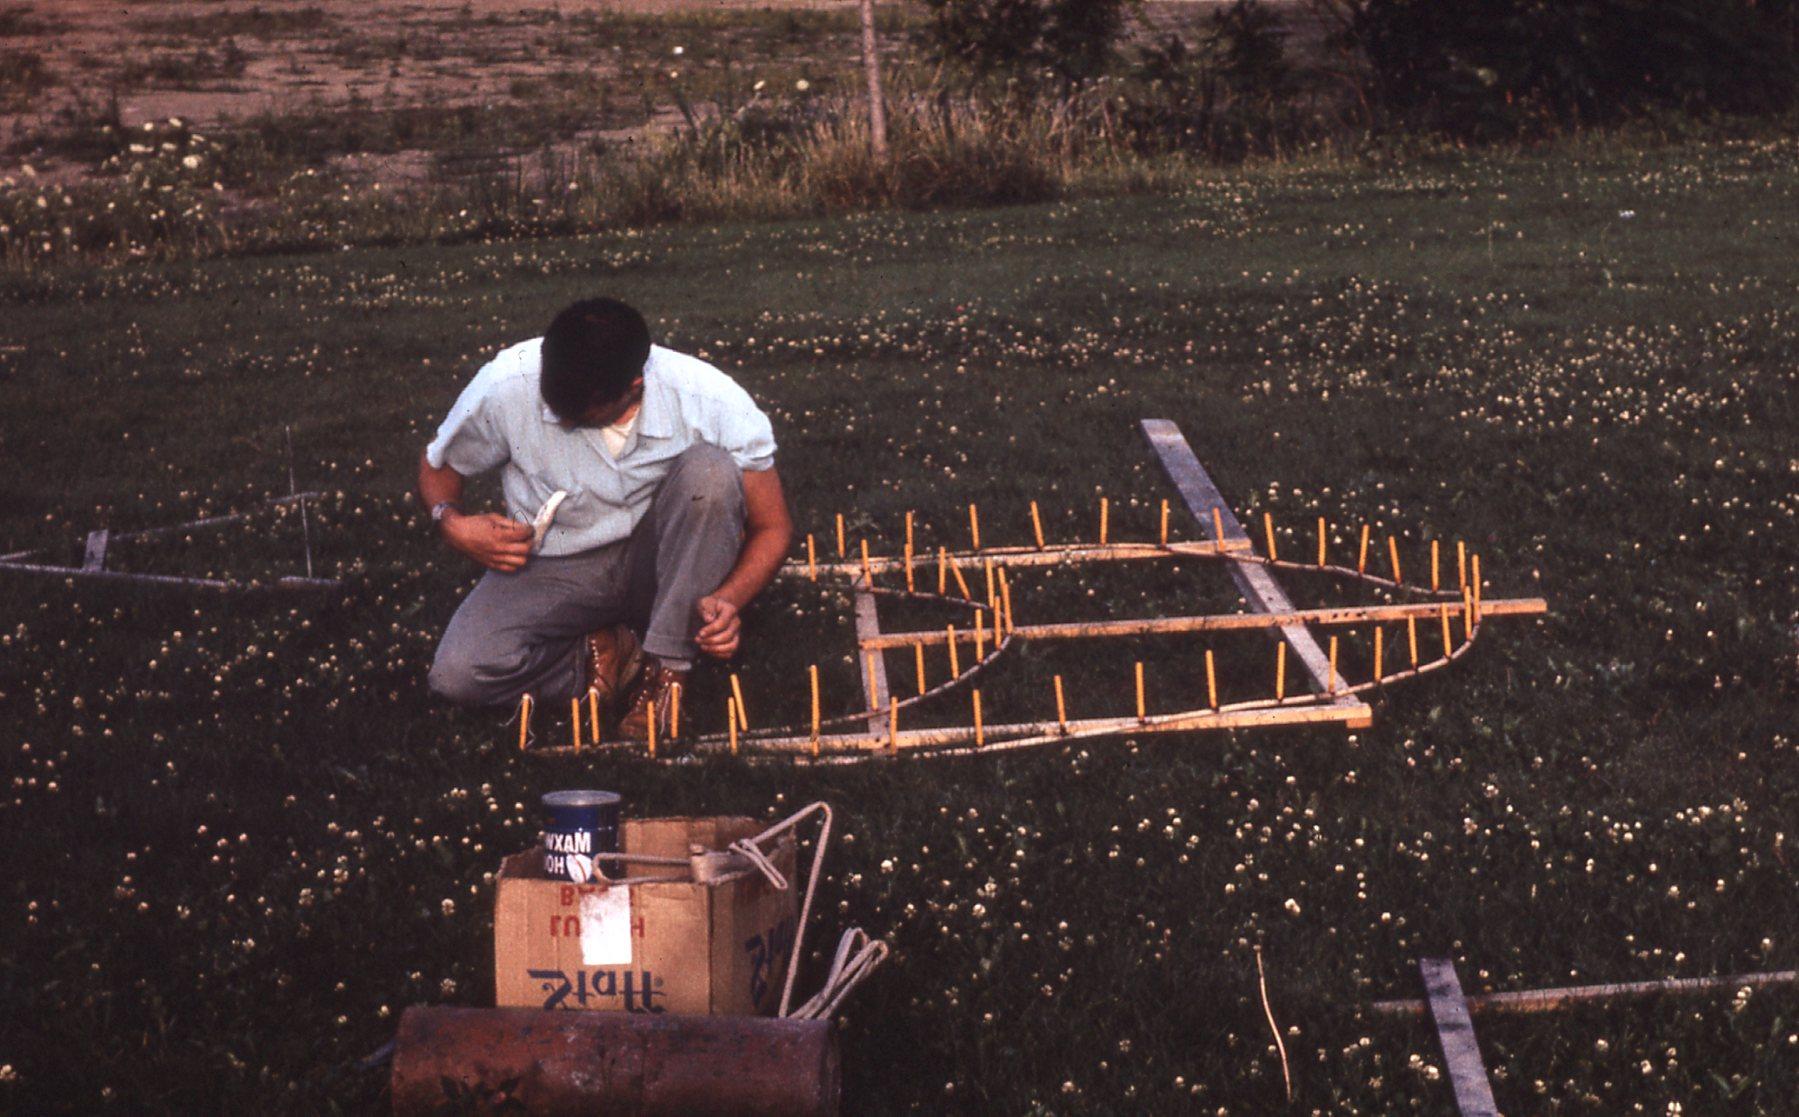 man assembling fireworks on ground